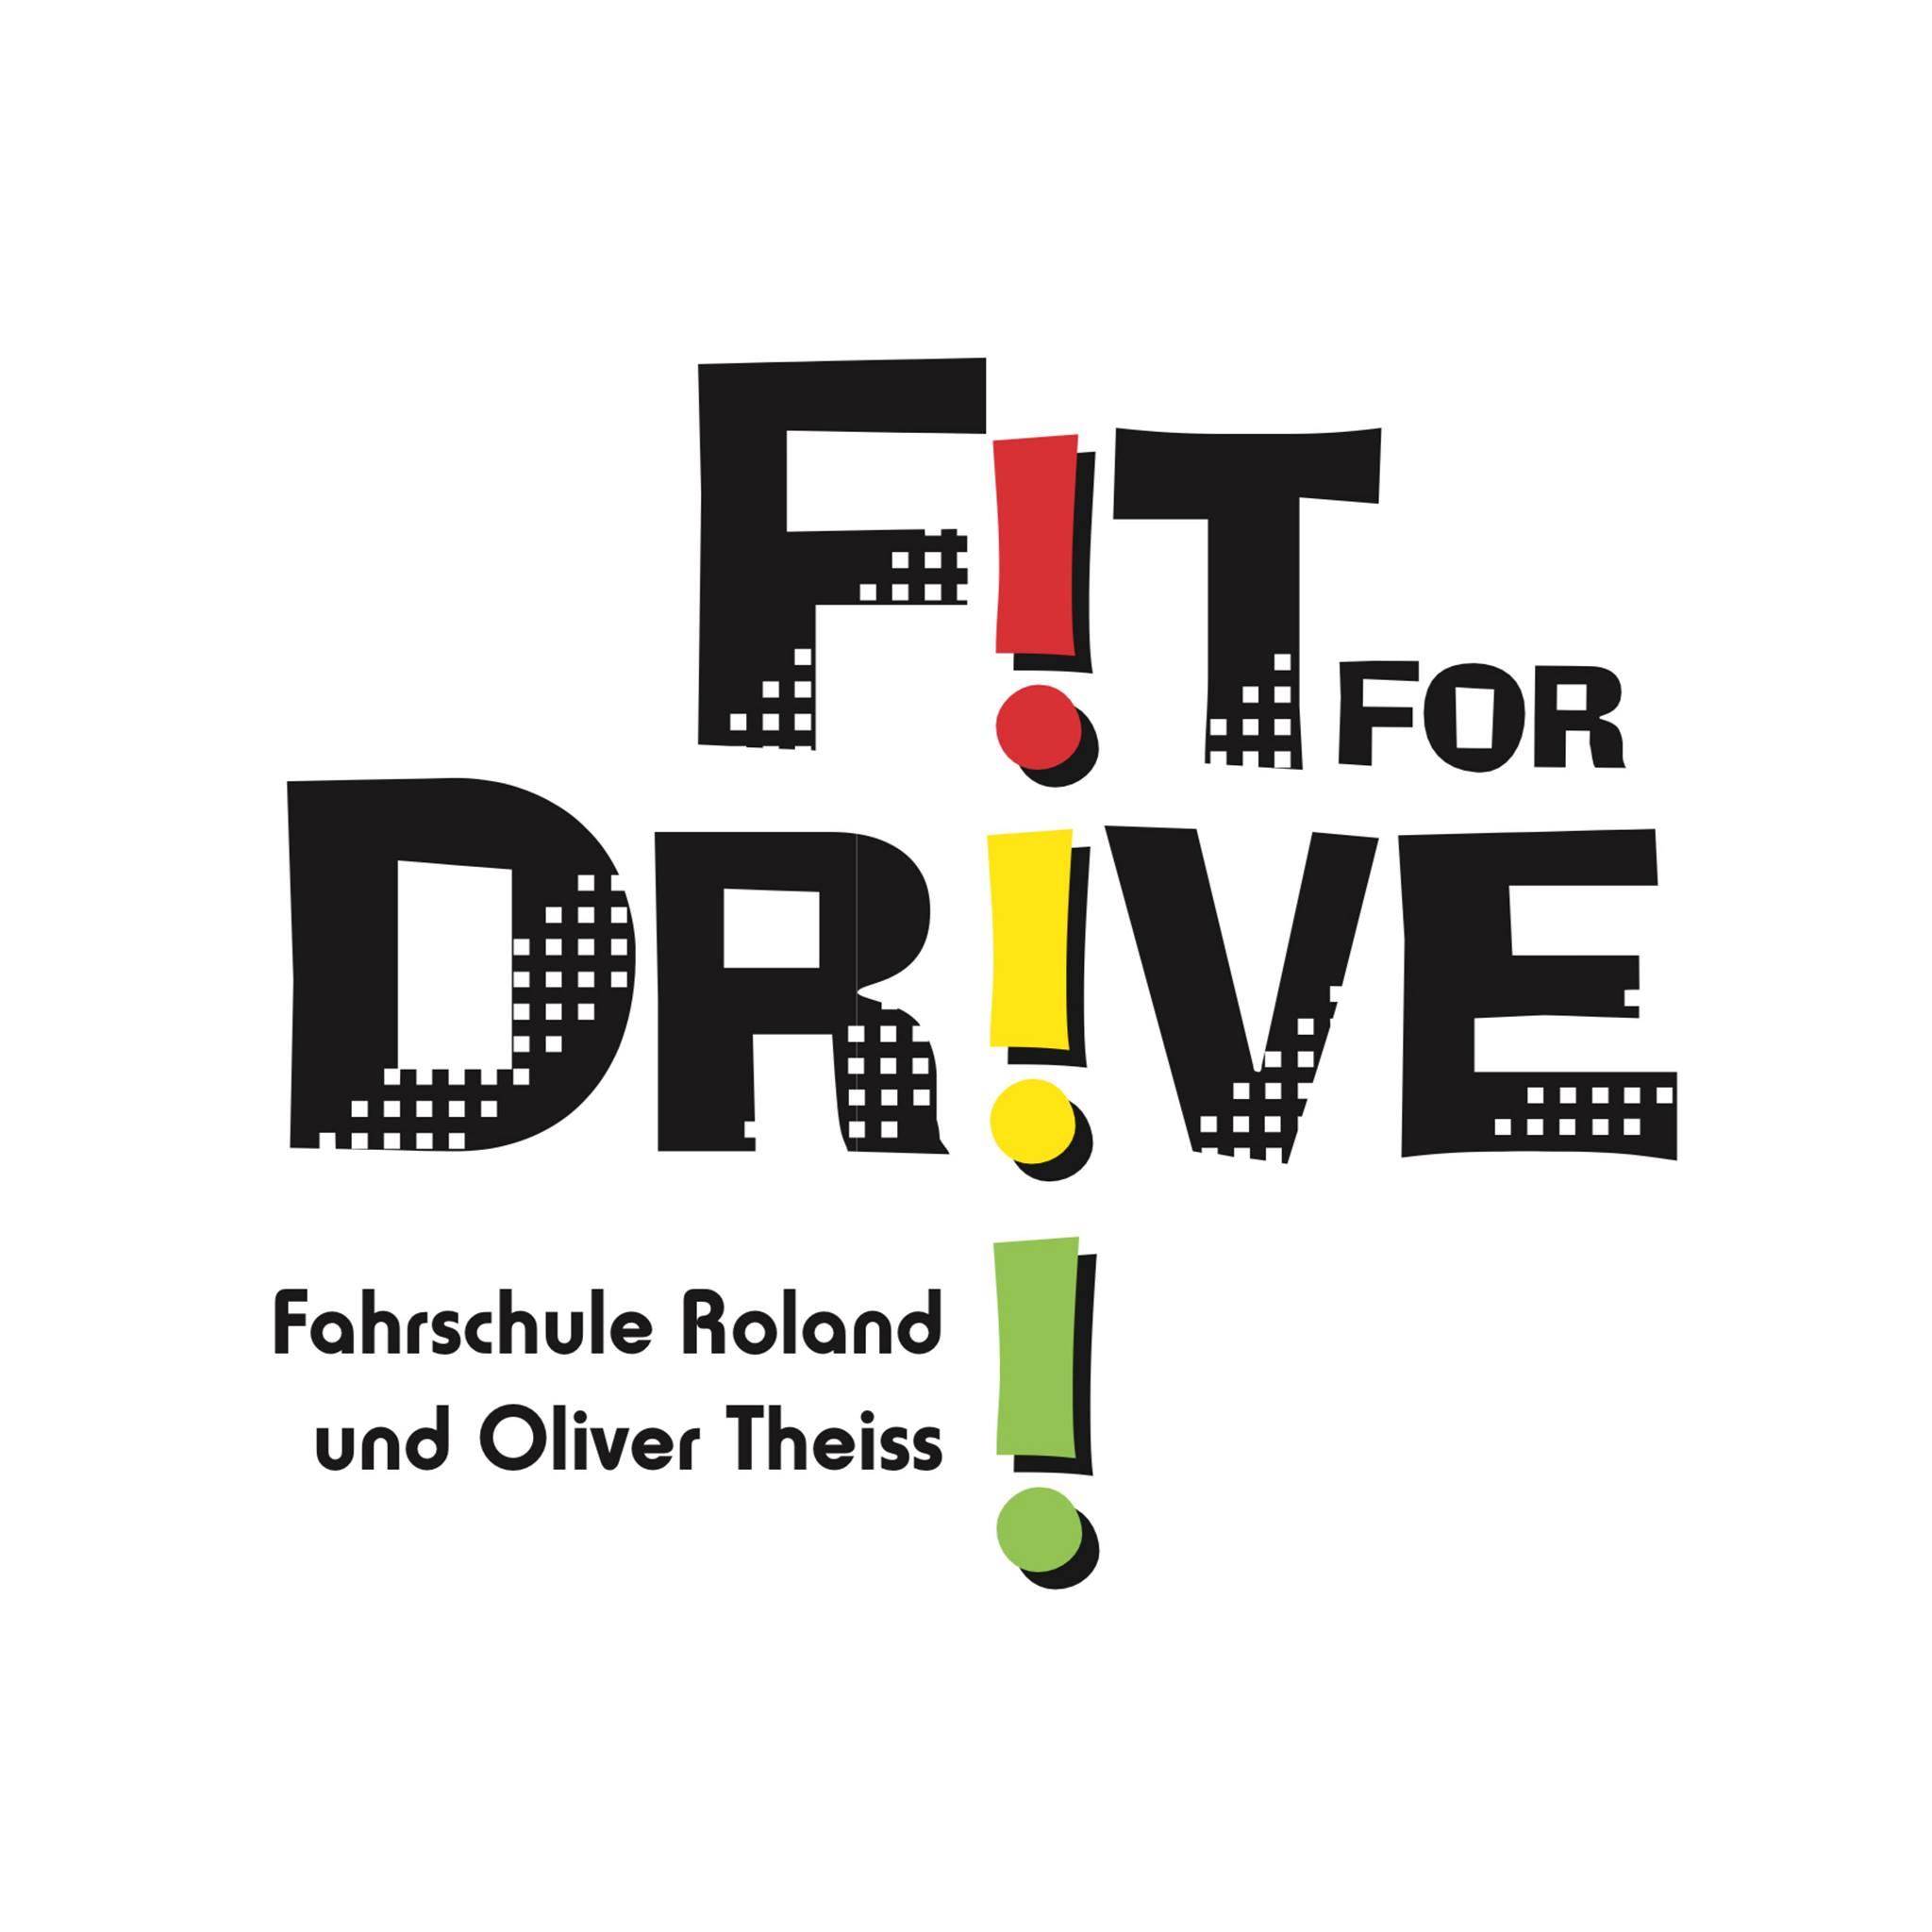 Fahrschule Fit for Drive Kaiserslautern